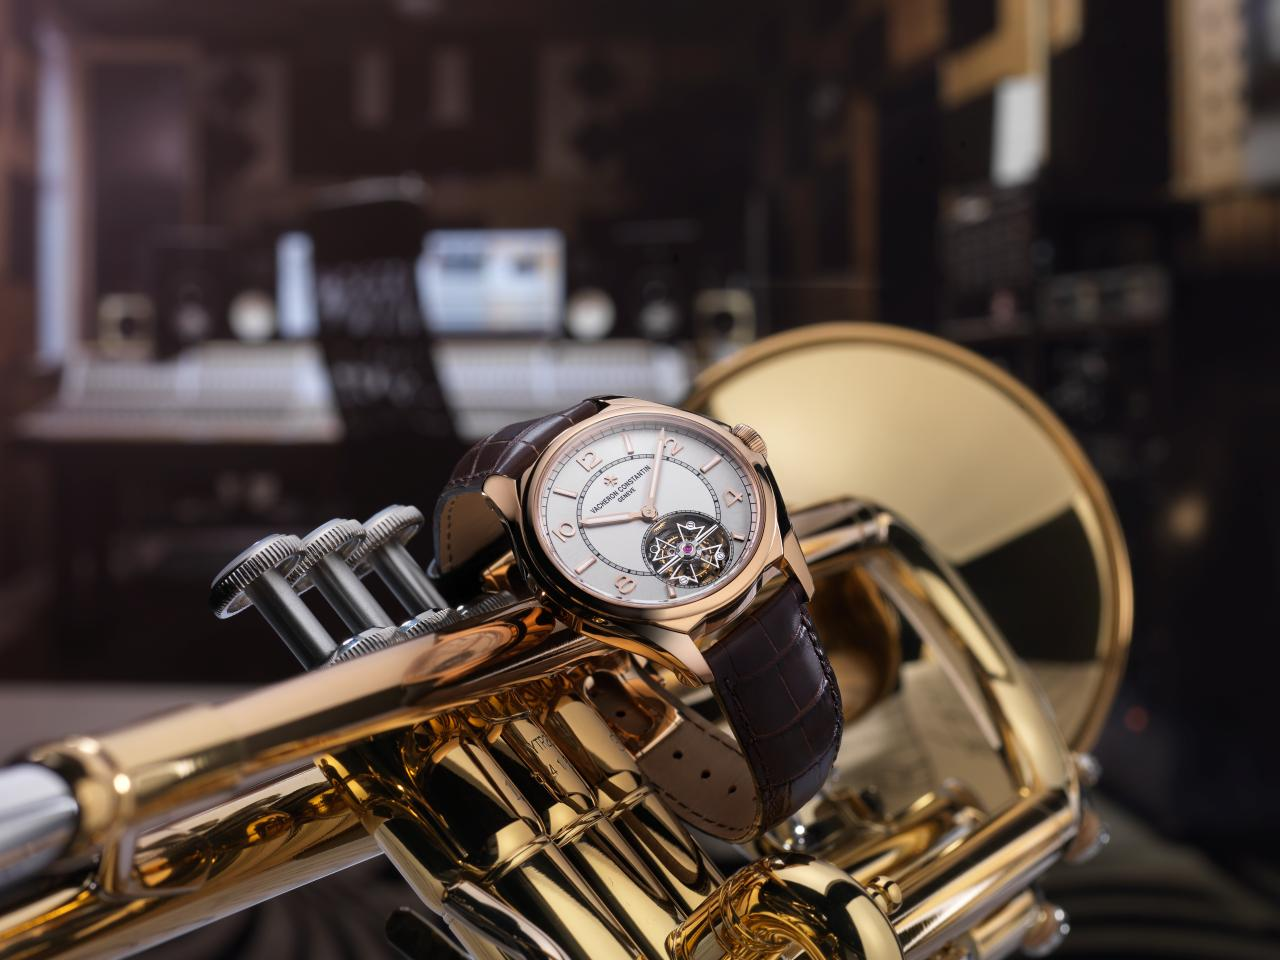 Vacheron Constantin FiftySix Tourbillon in de Abbey Roads Studios